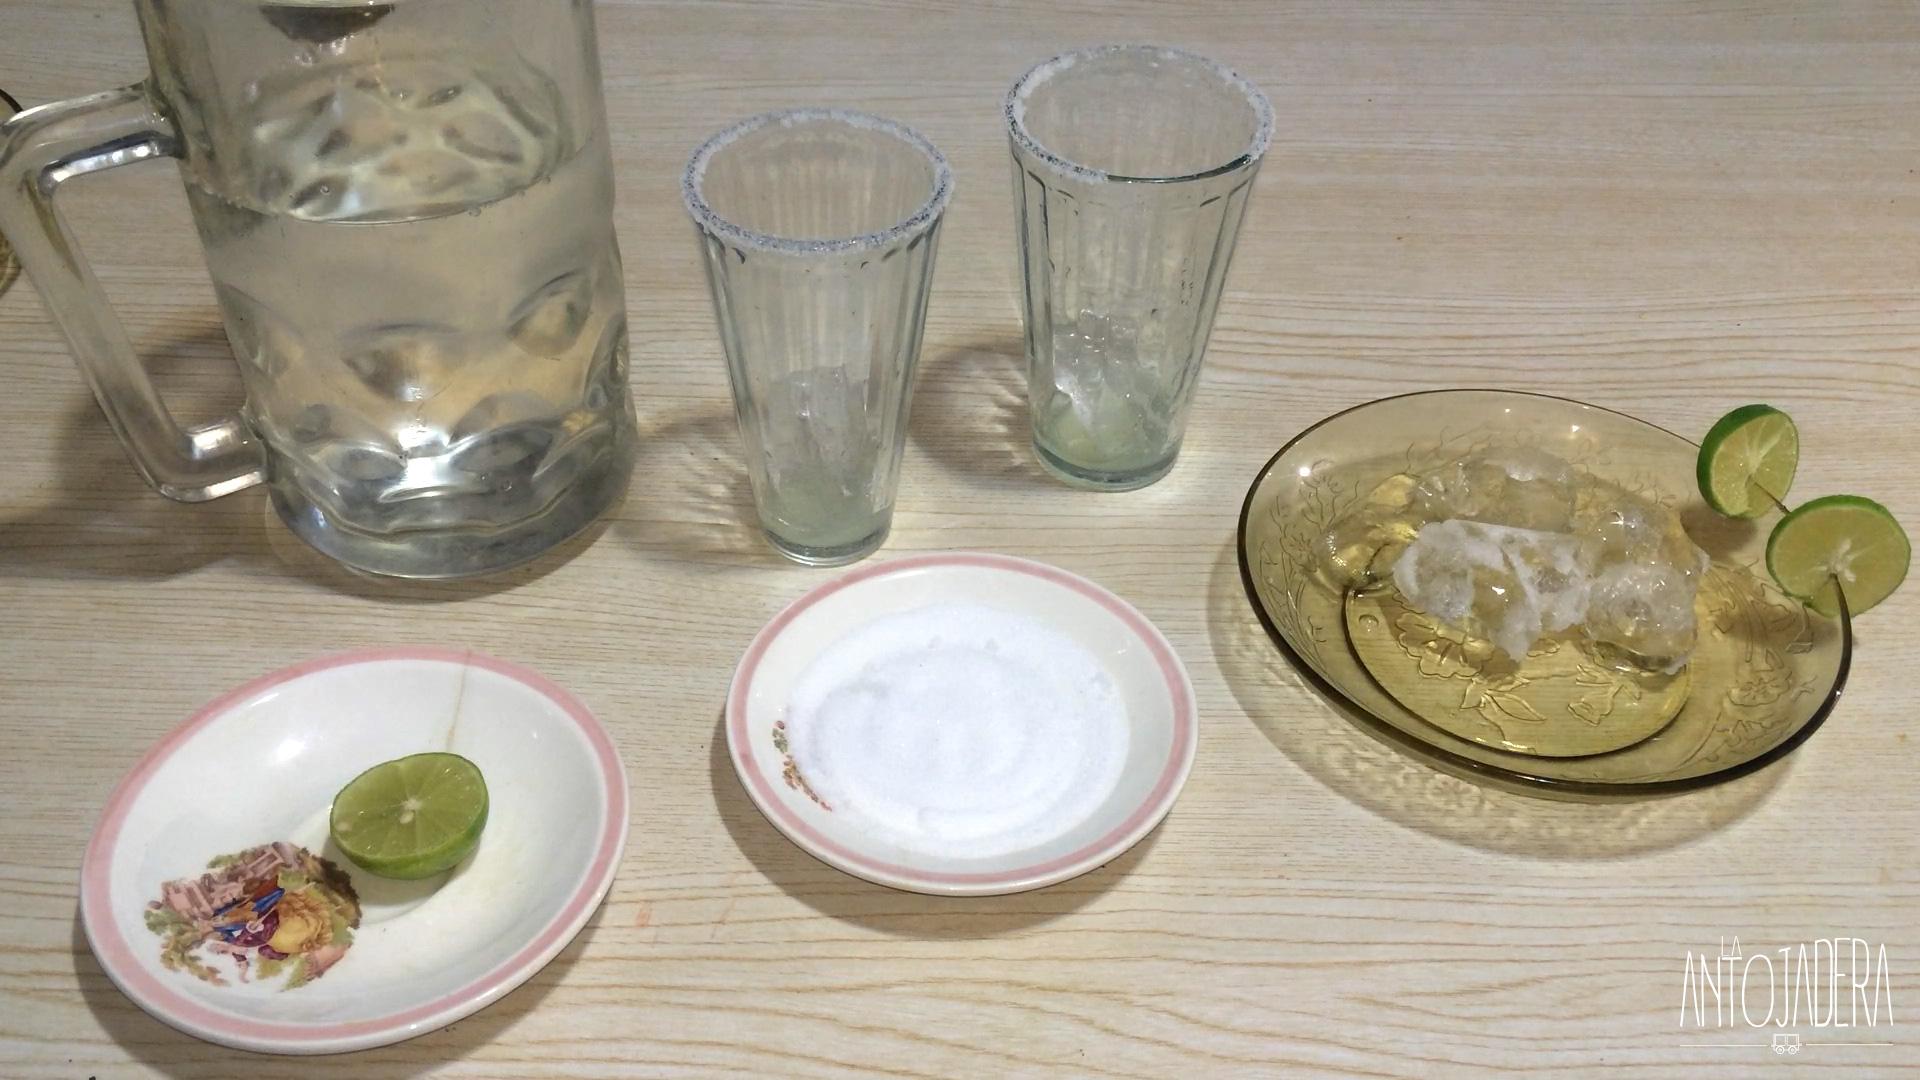 La Antojadera | Agua Mineral Preparada